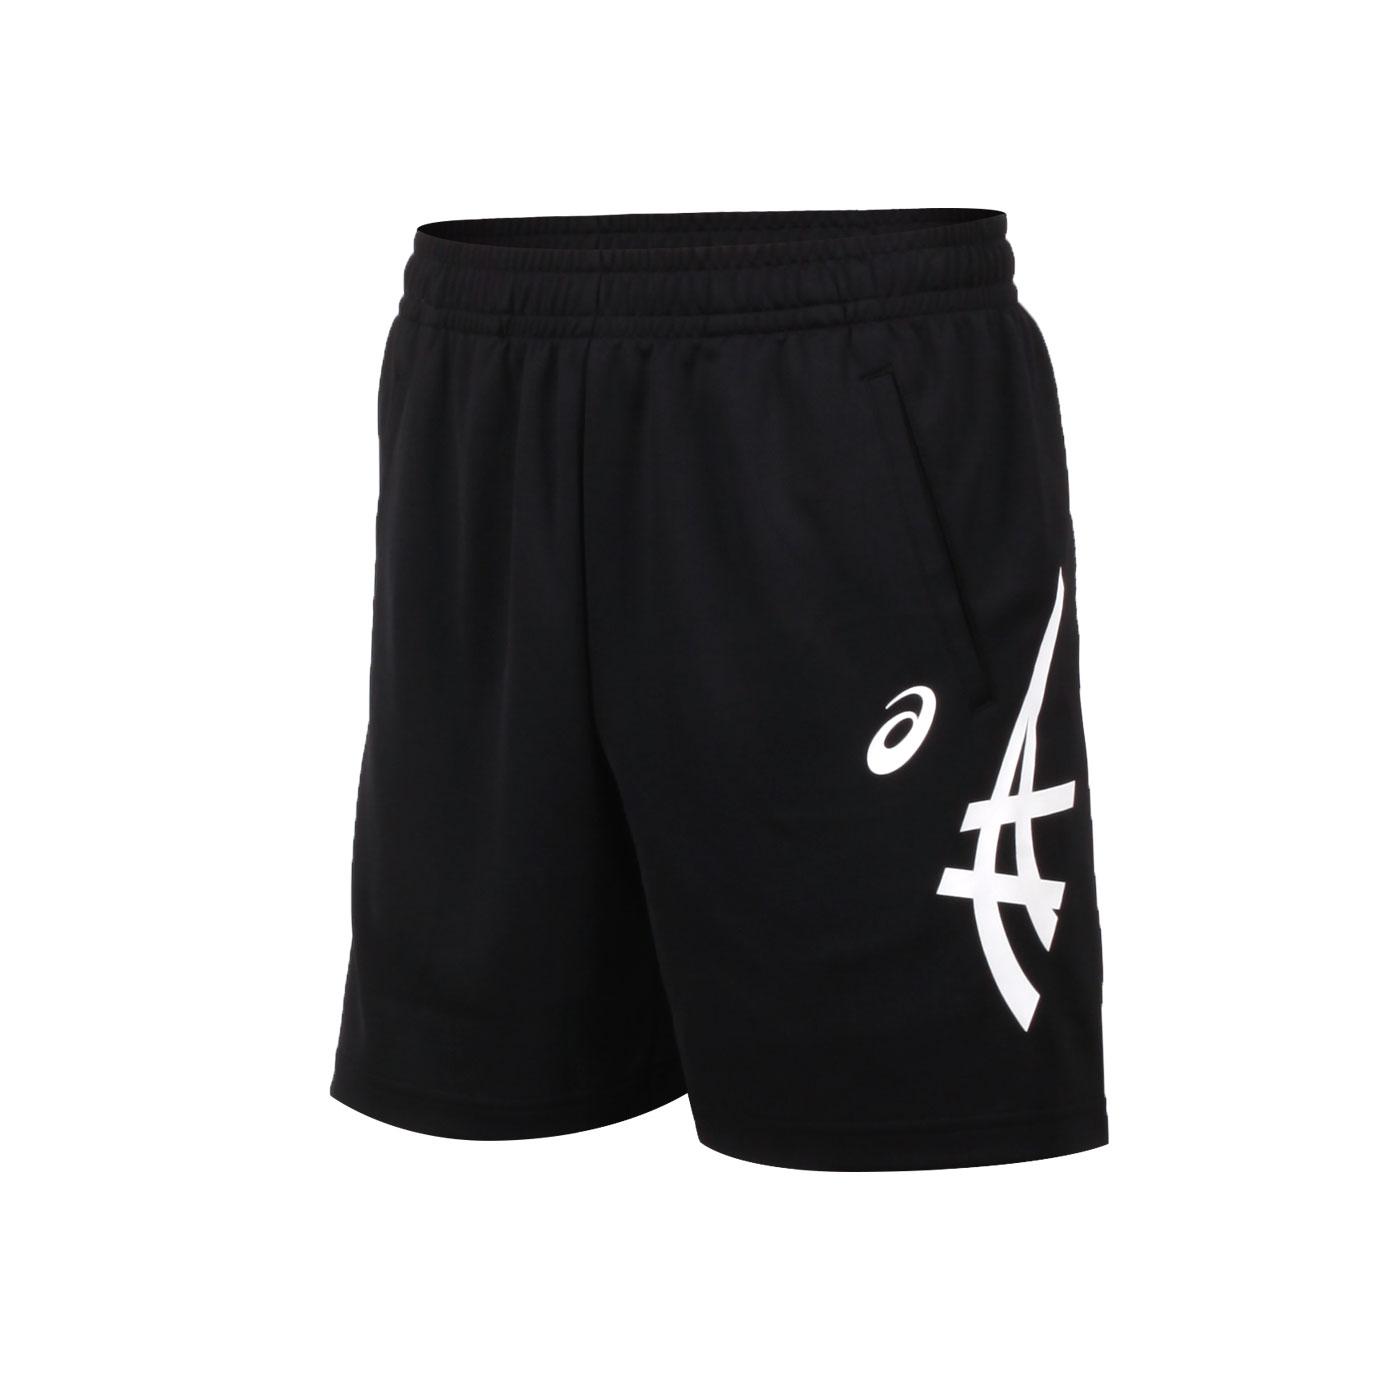 ASICS 男款長版球褲 2053A139-001 - 黑白